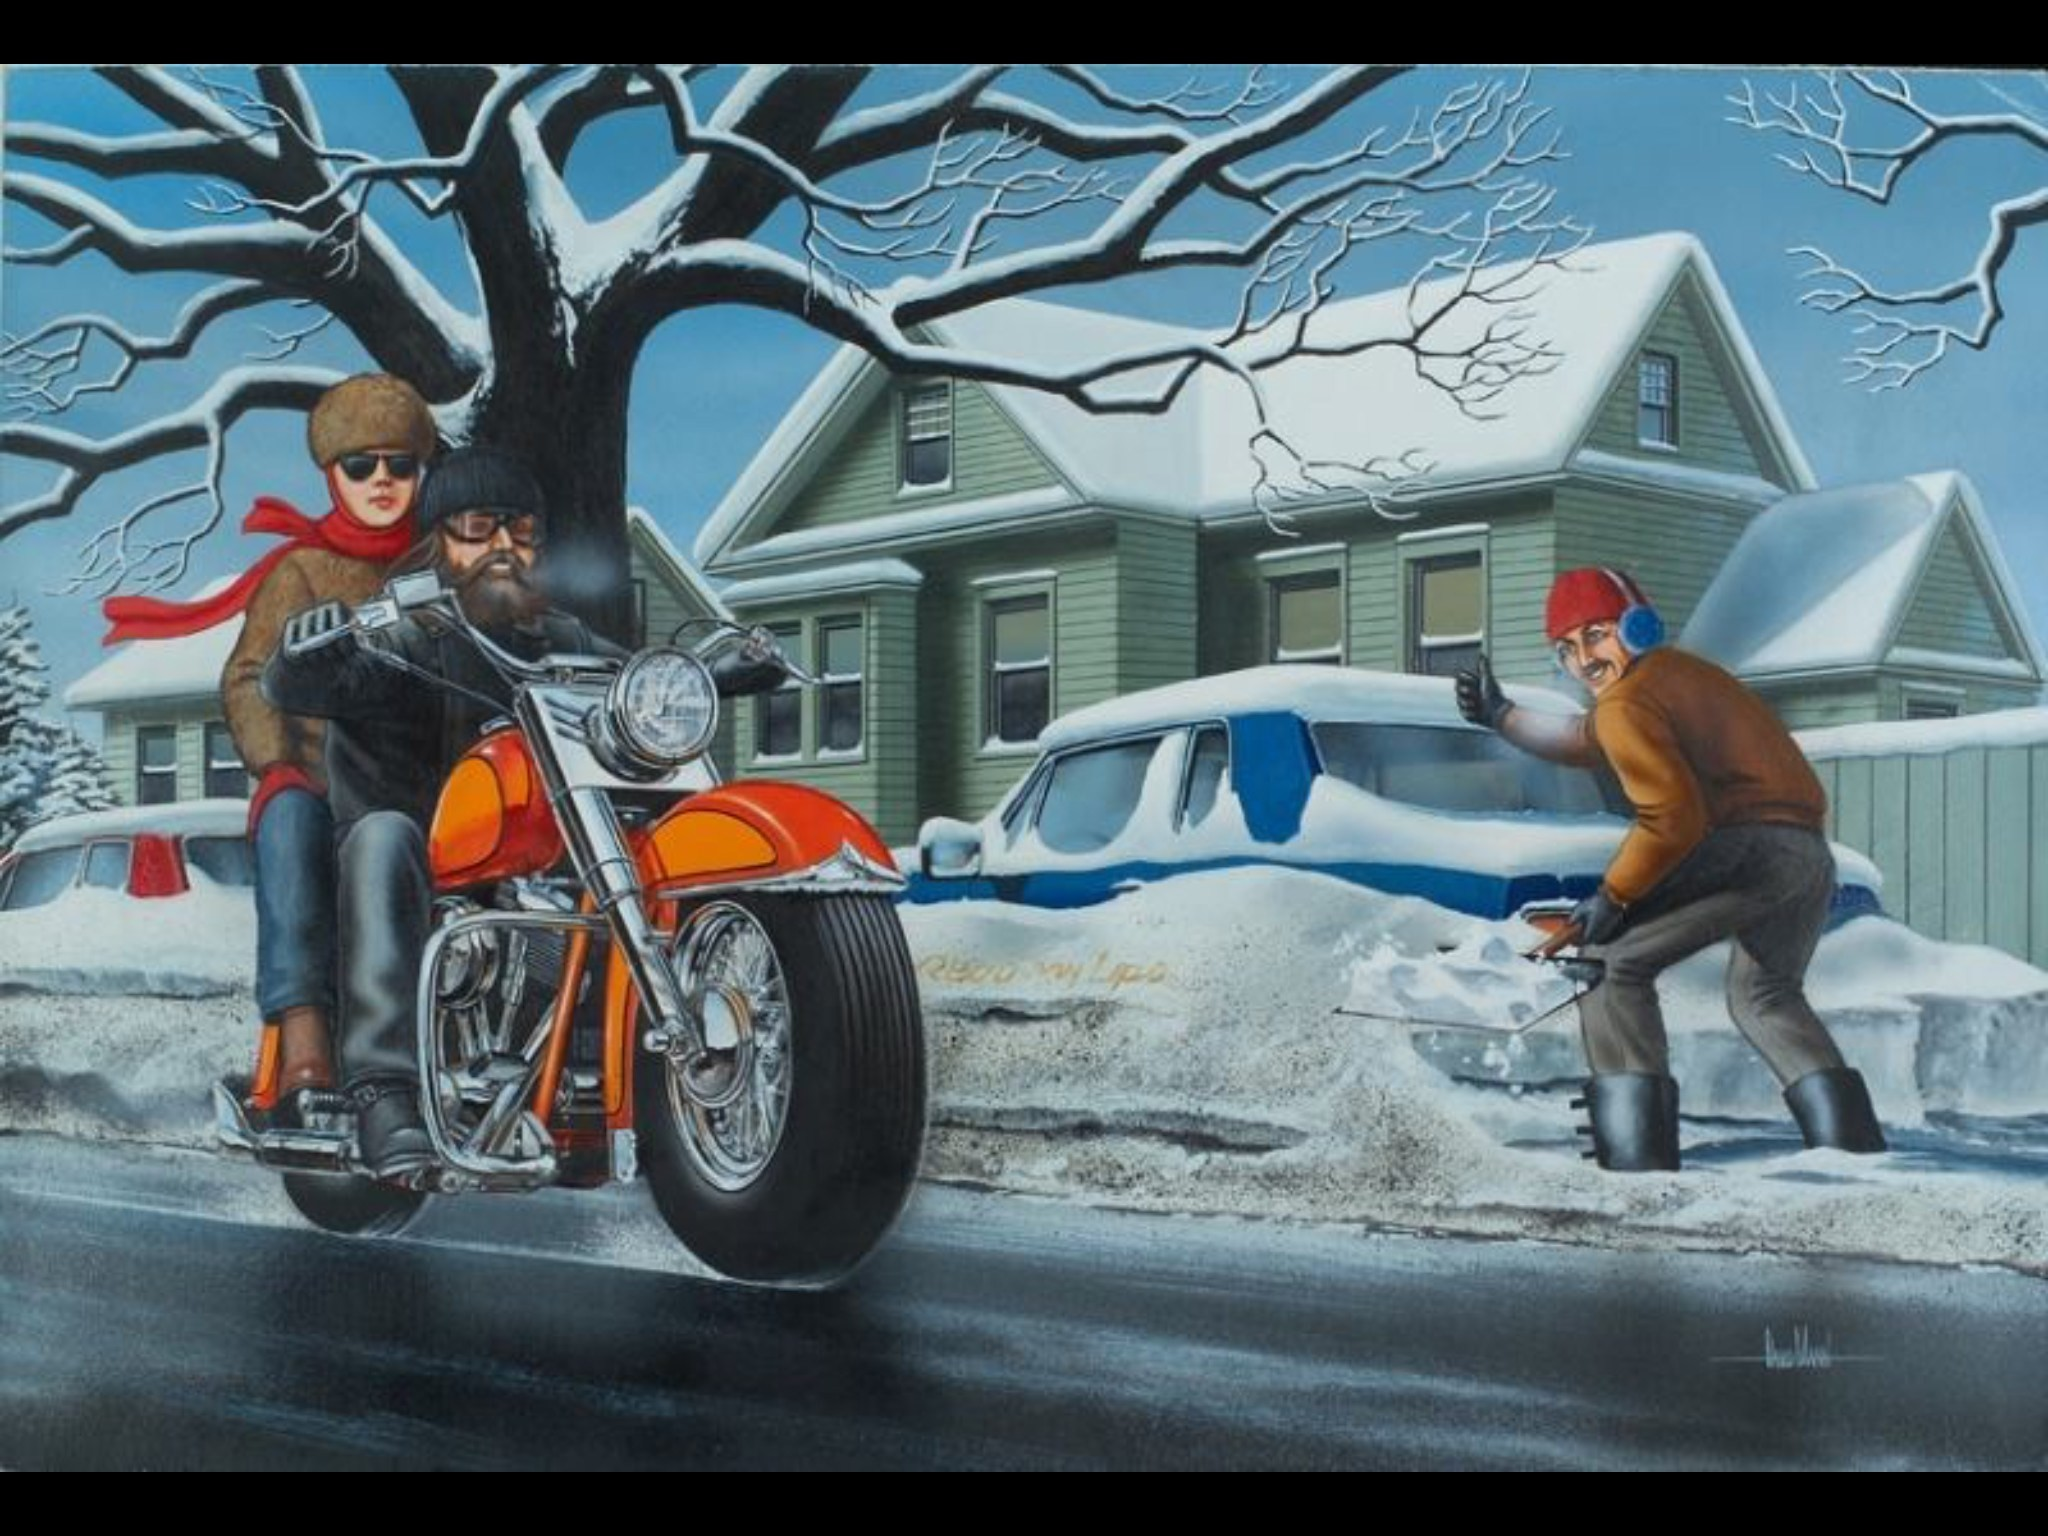 Res: 2048x1536, Fullsize Of David Mann Art ...